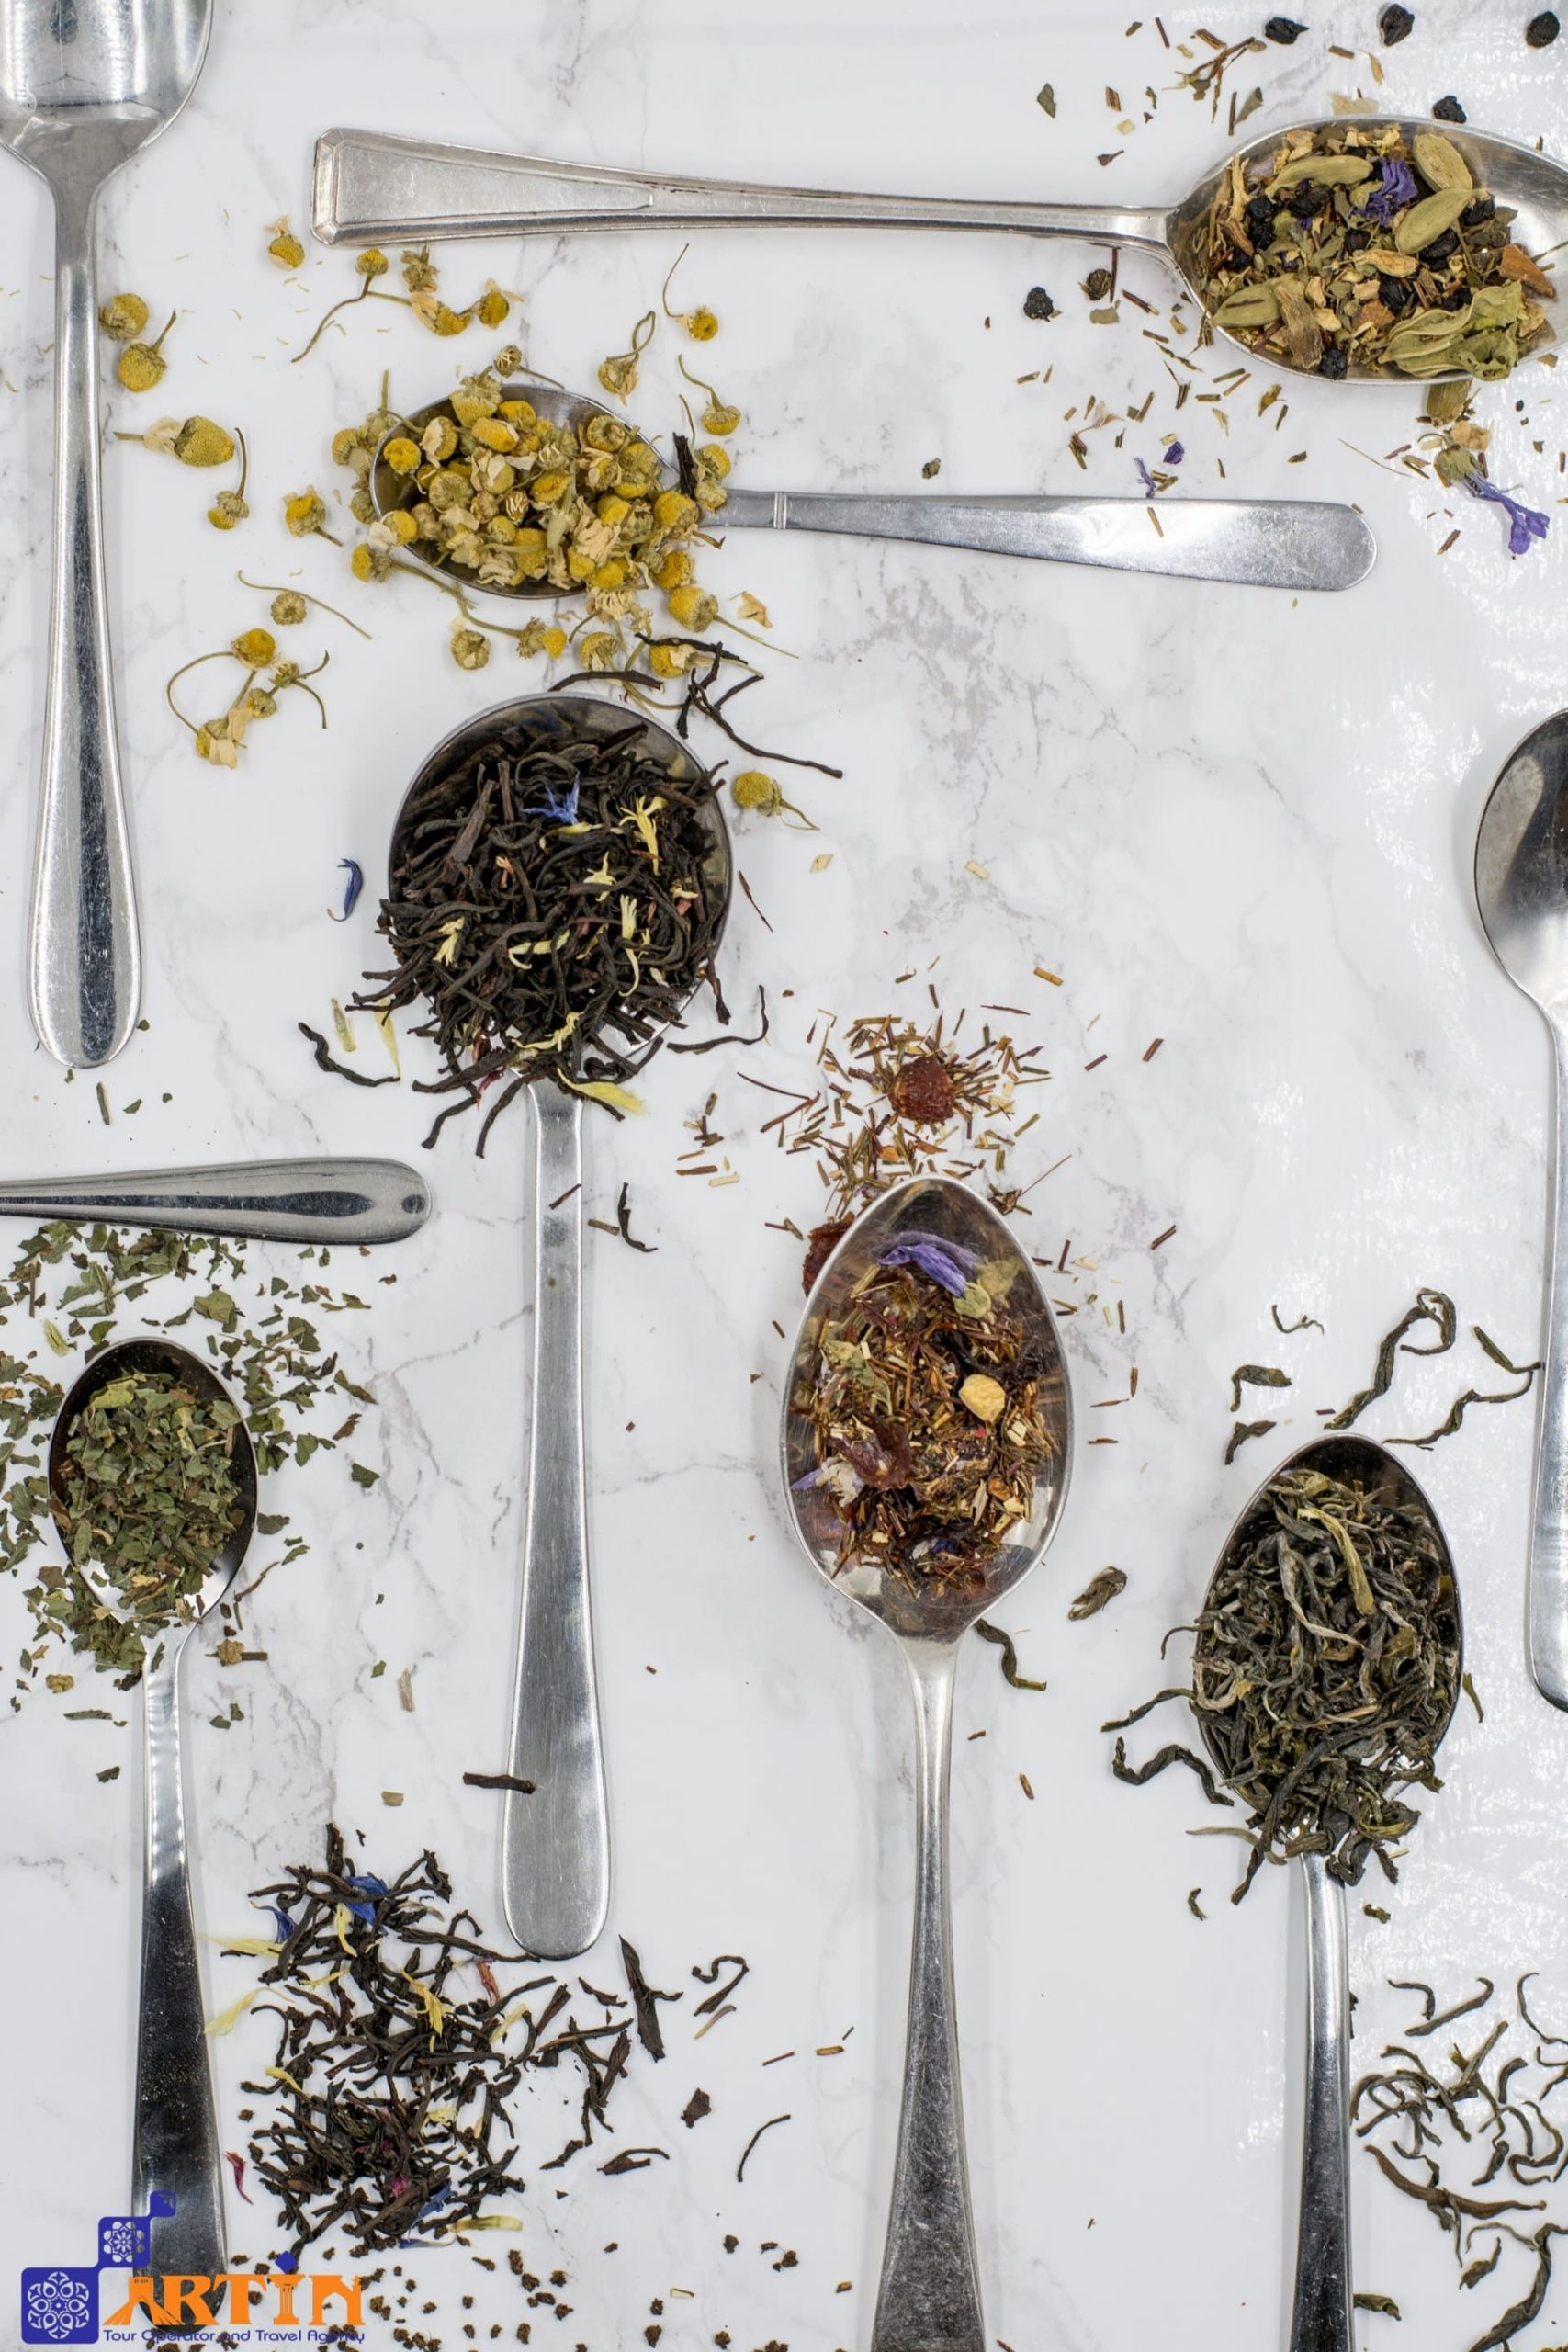 Damnoosh Persian herbal drink travelers must try